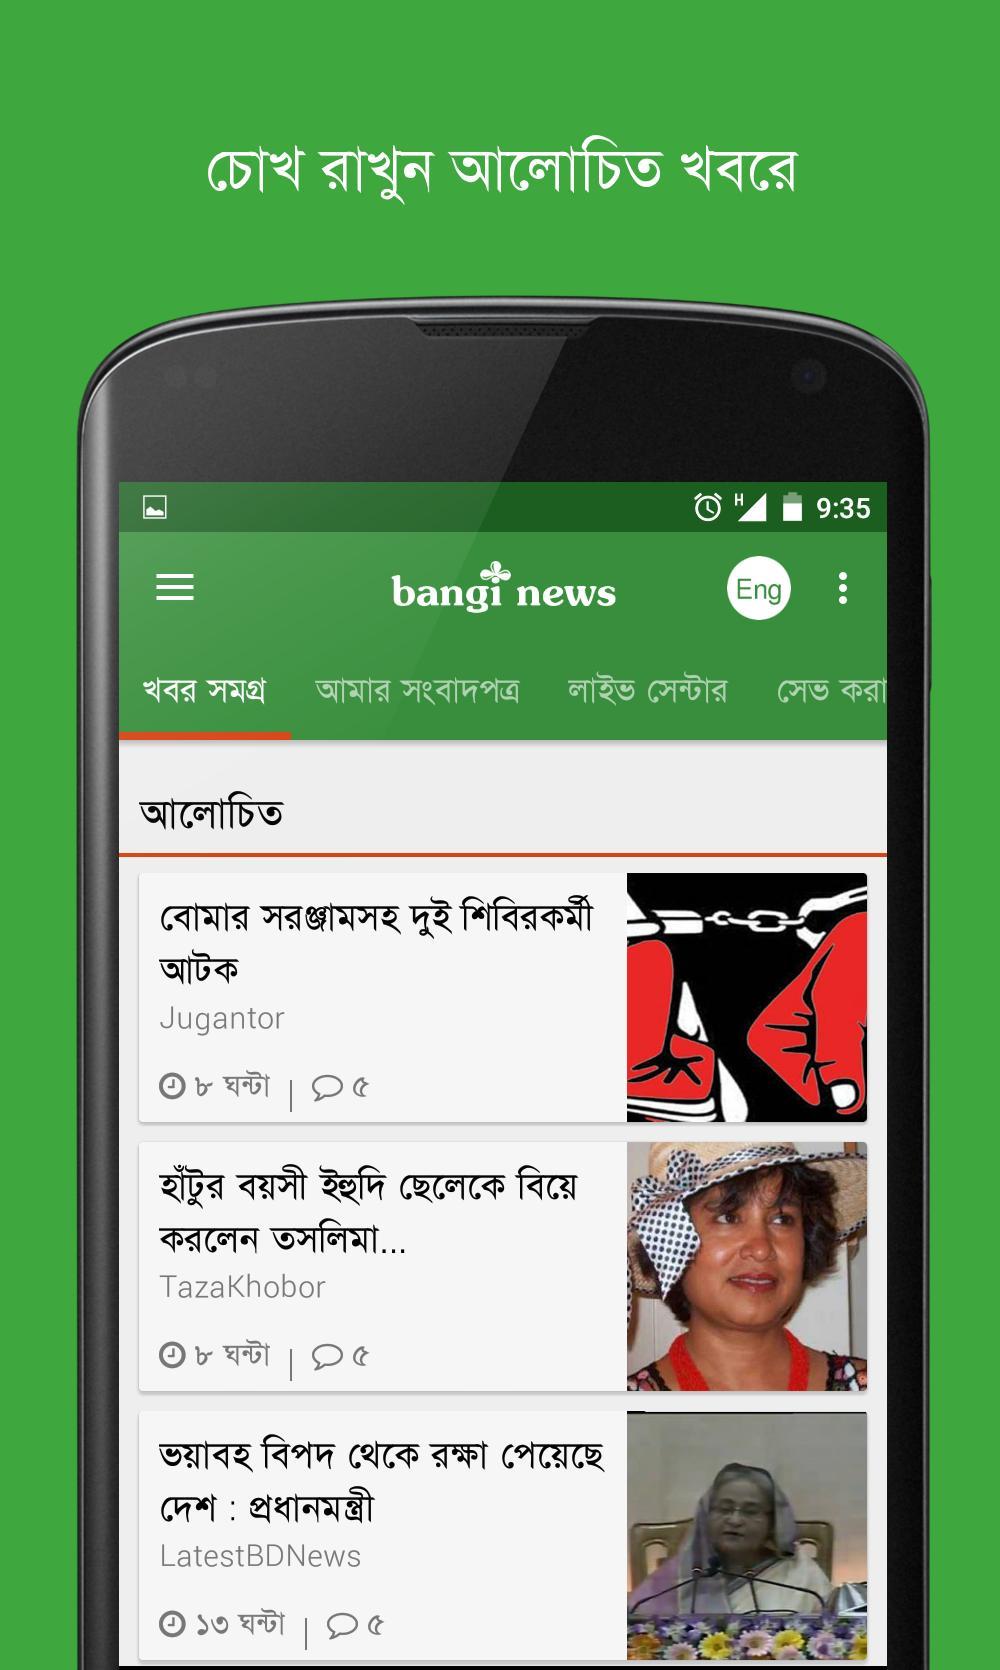 Bangla News & TV: Bangi News 7 تصوير الشاشة